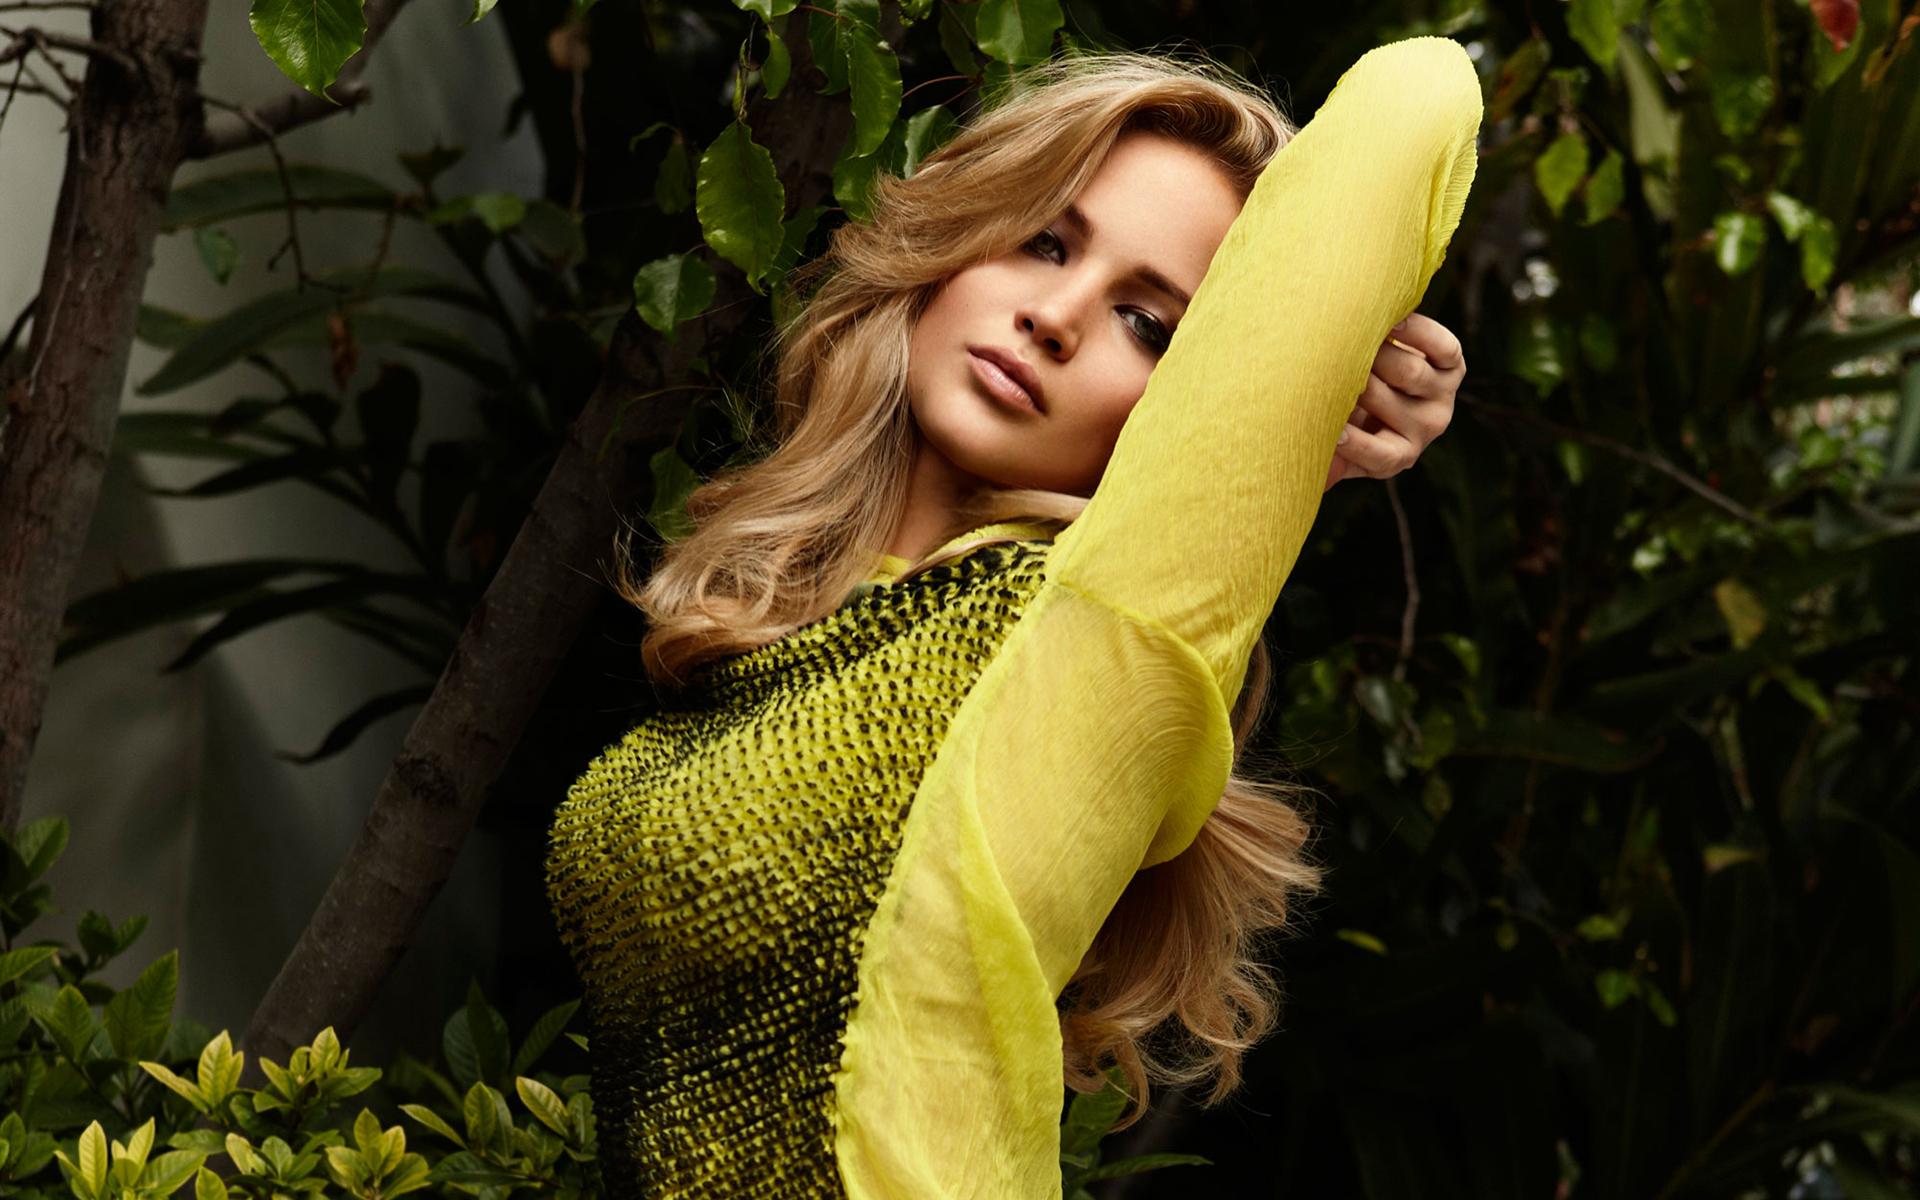 Hot Actress Jennifer Lawrence Wallpapers HD 1920x1200